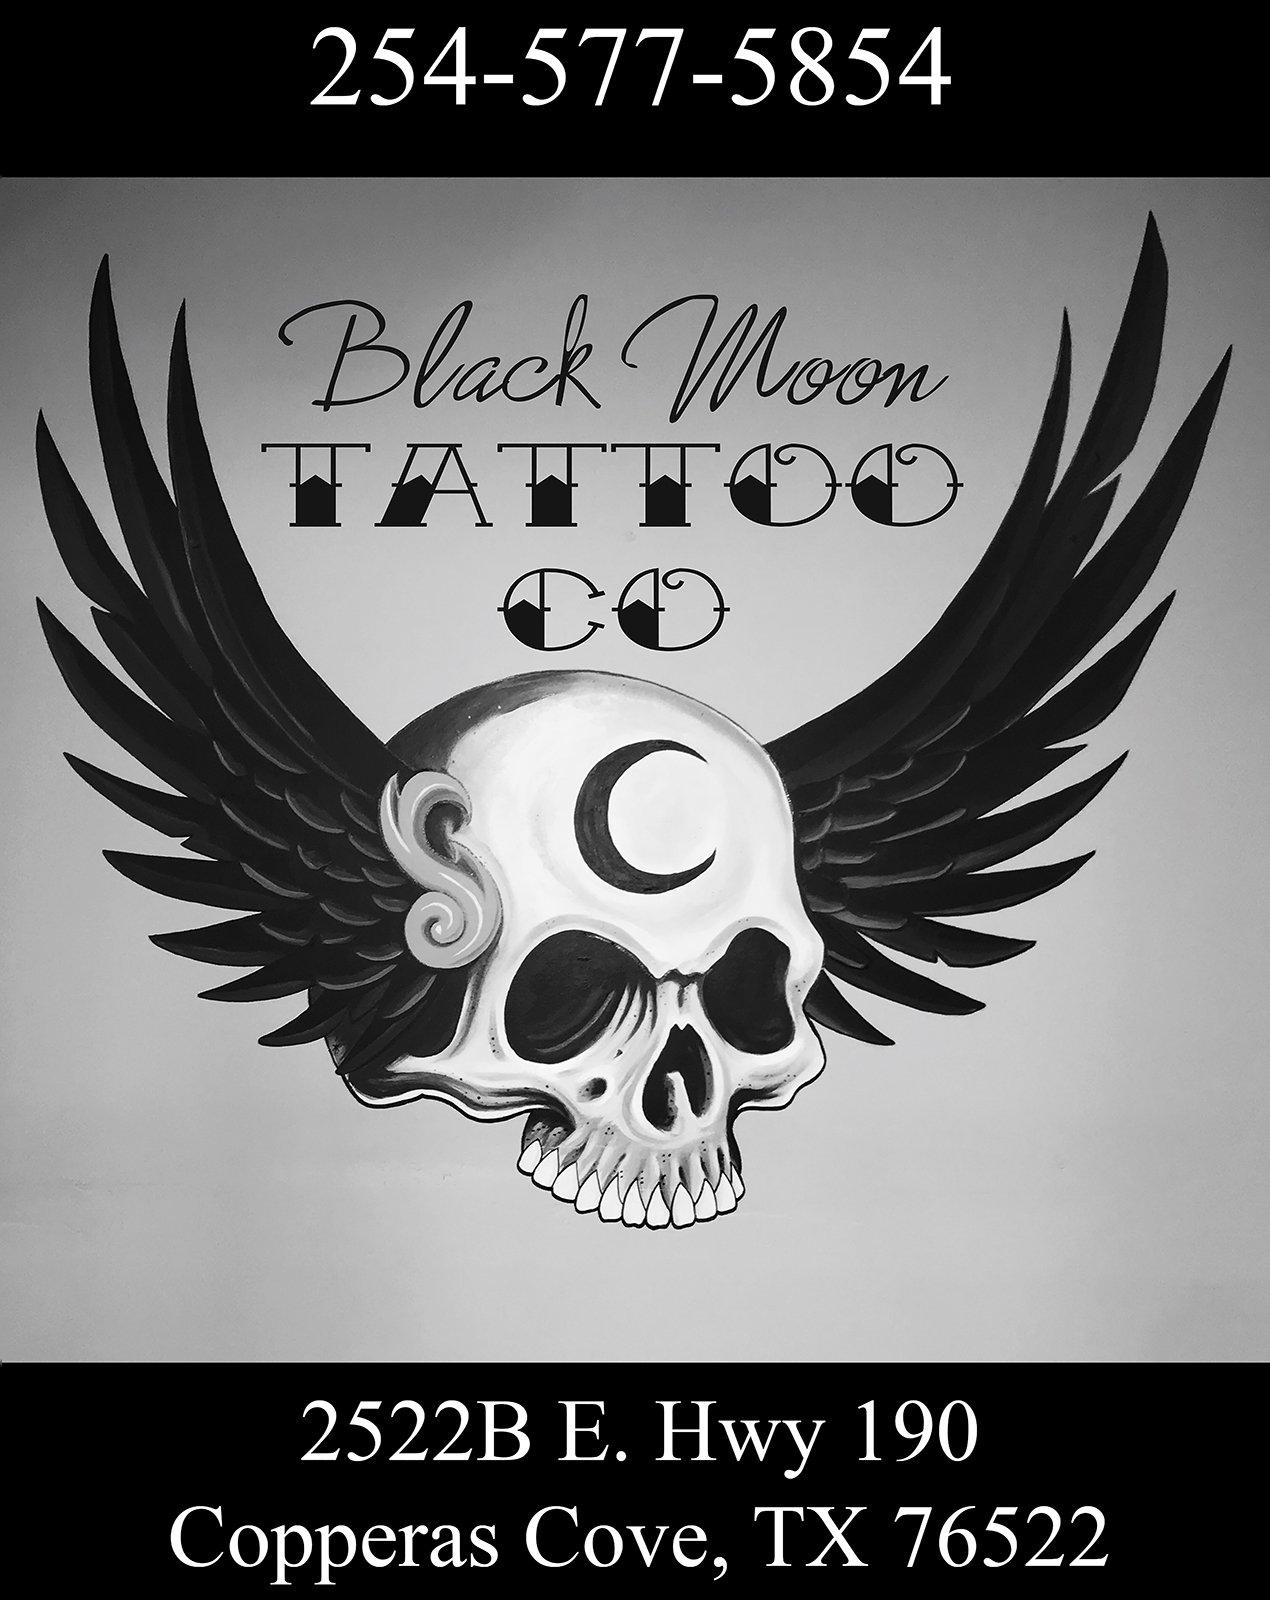 Black Moon Tattoo Company Copperas Cove Texas